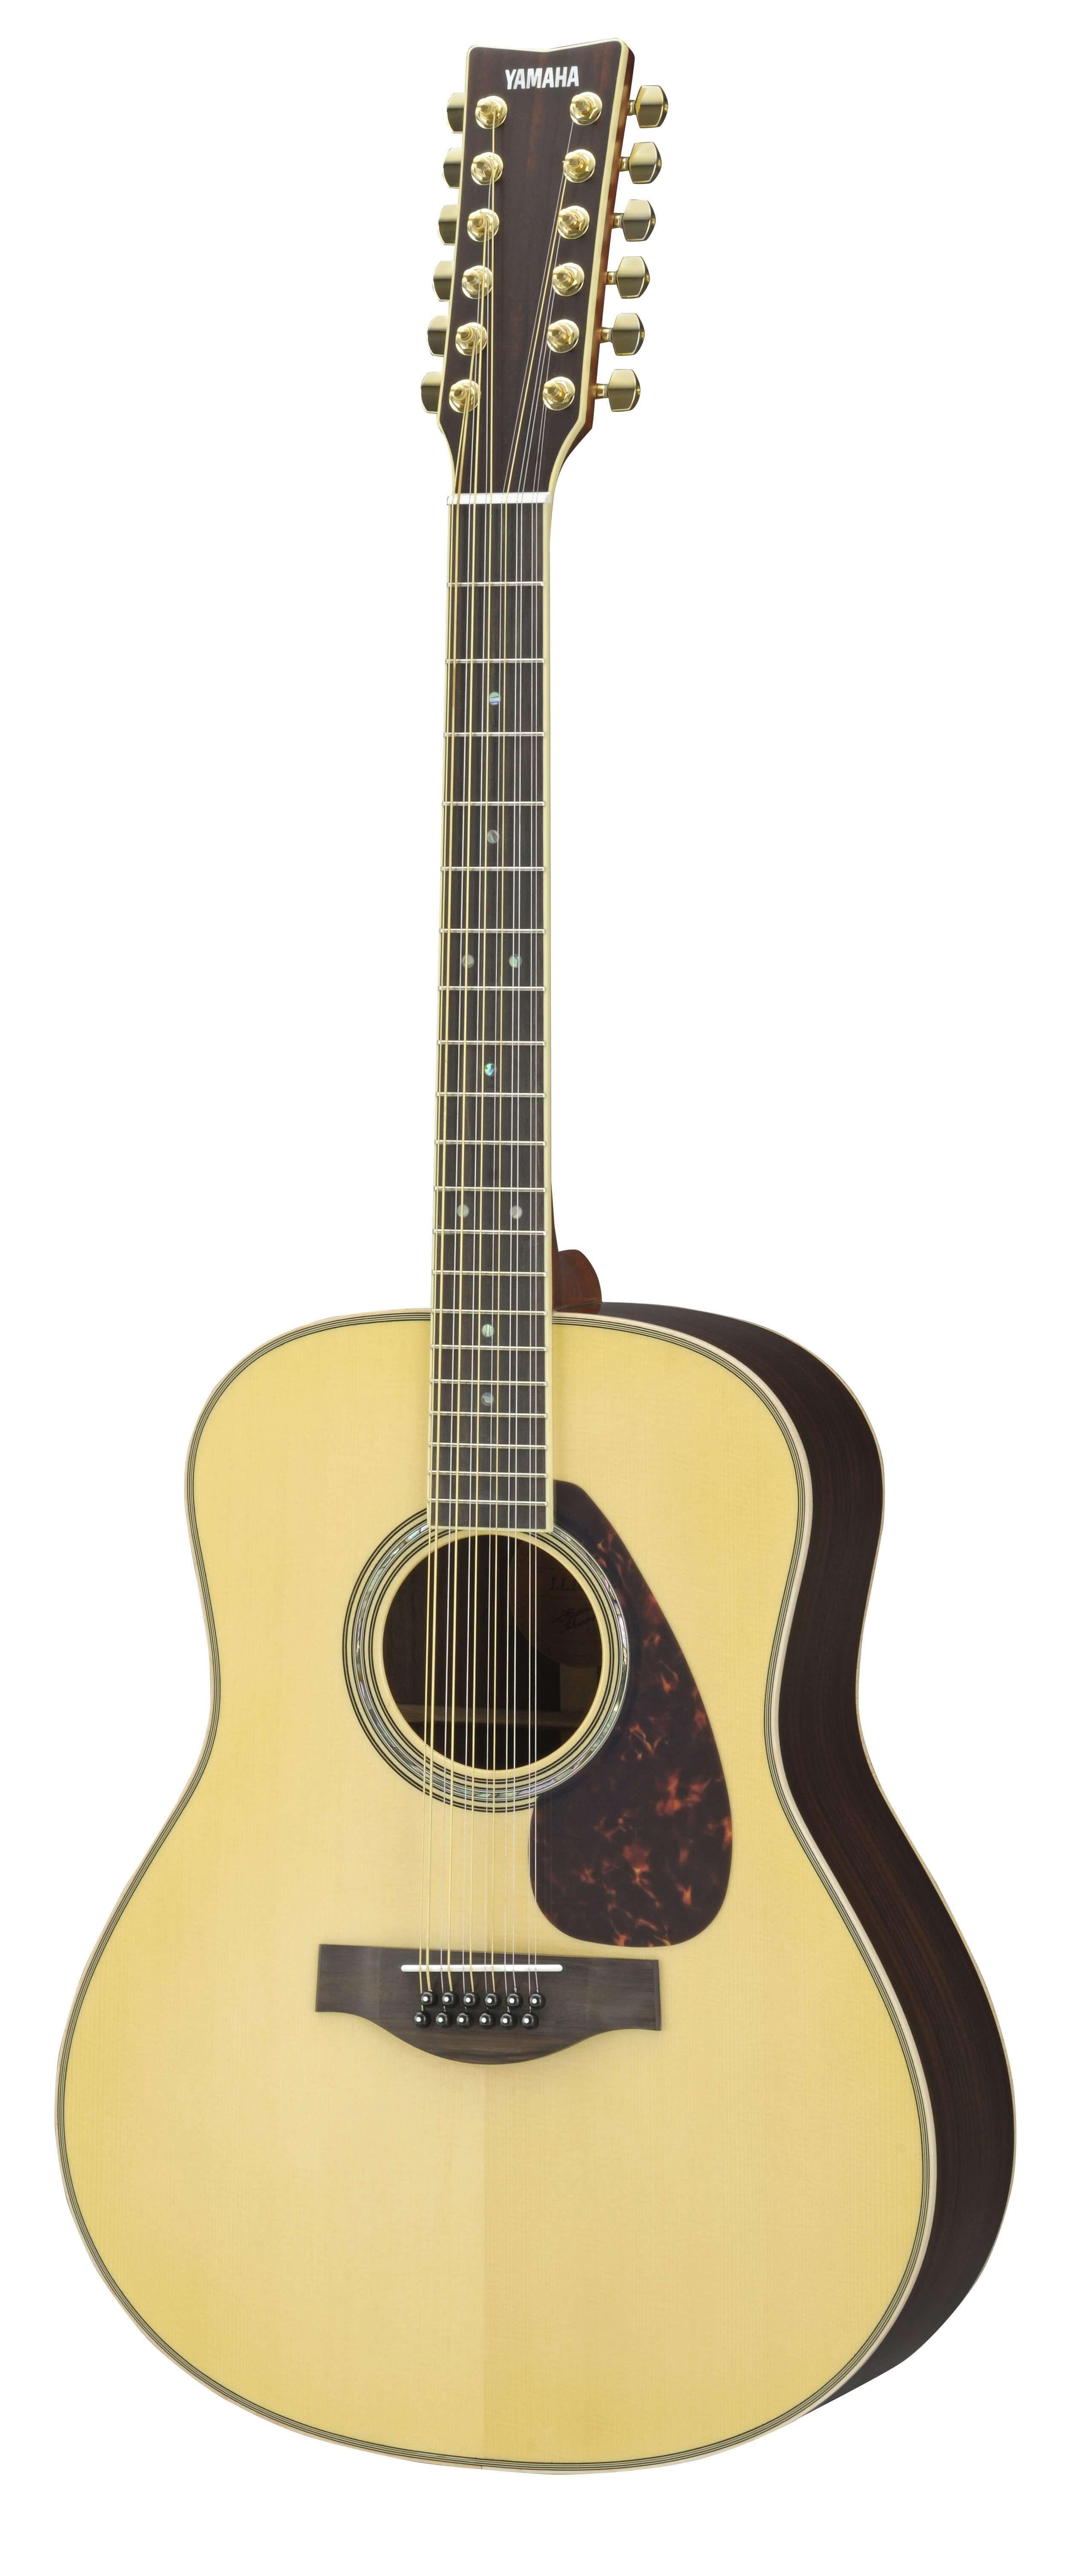 Guitarra Acústica Yamaha LL16-12 ARE 12 Cuerdas